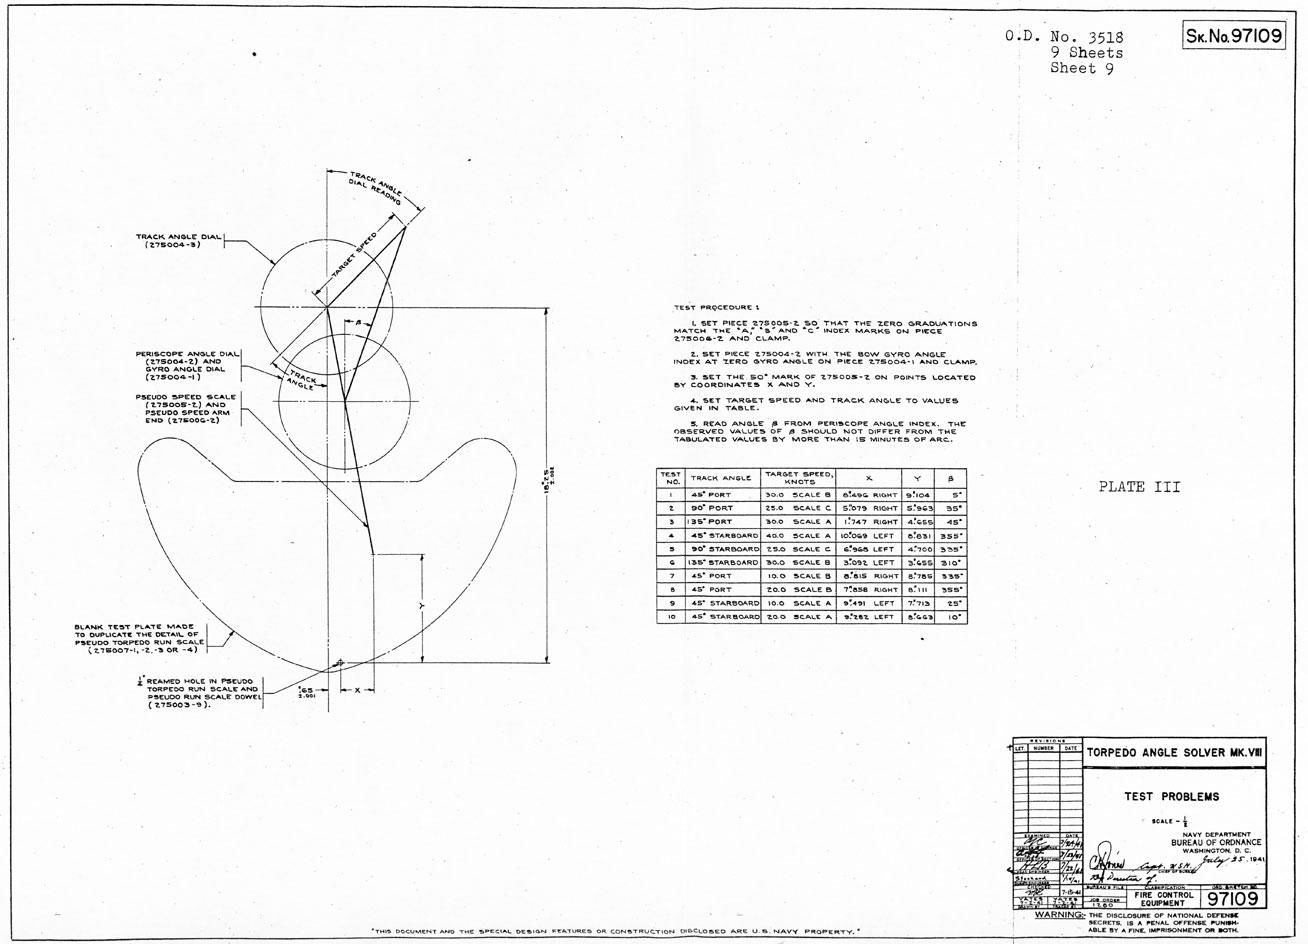 Torpedo Angle Solver Mark Viii Operating Instructions